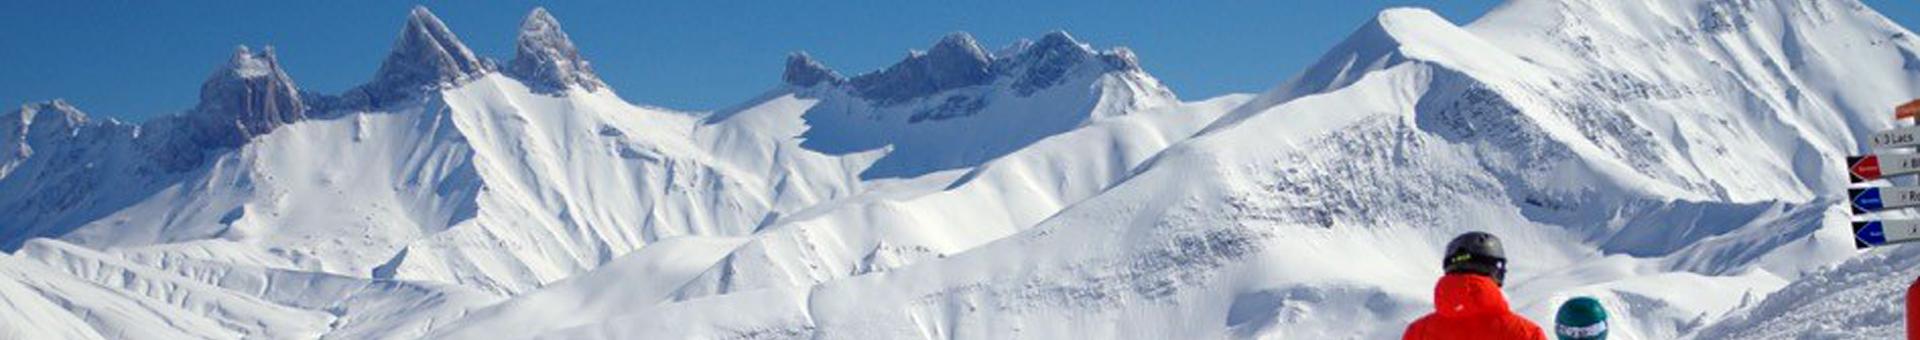 Ski > Domaine skiable des Sybelles > tetiere